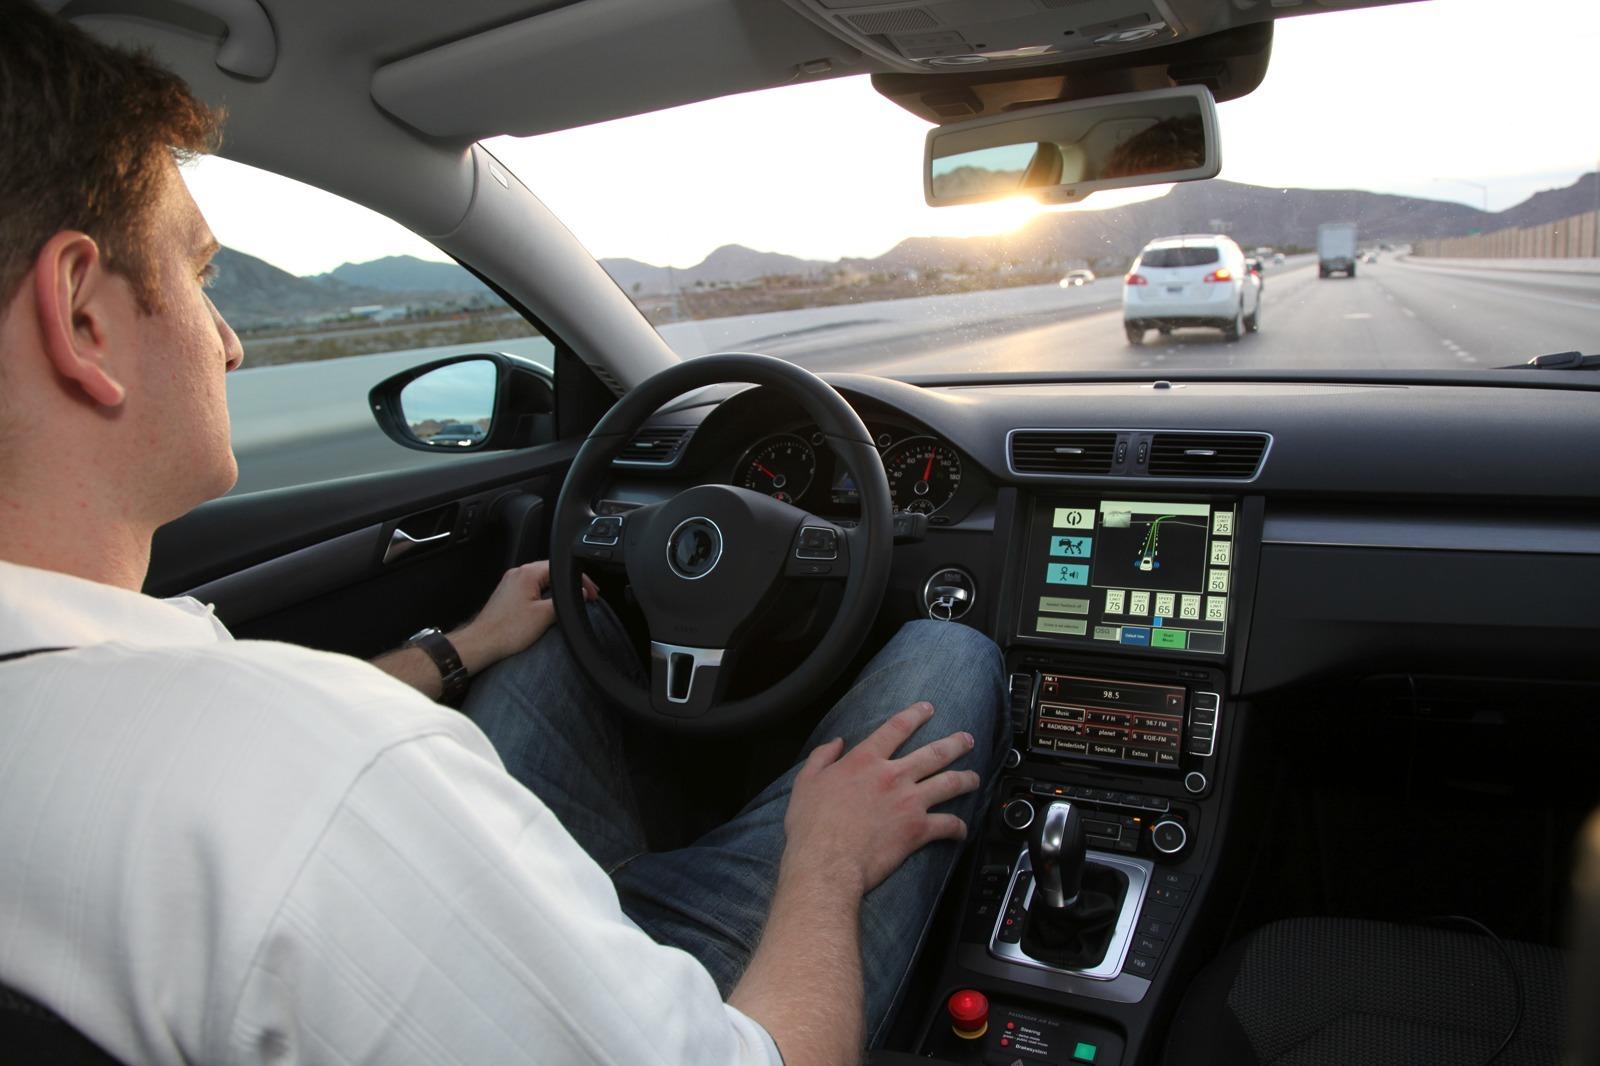 driving-car-app